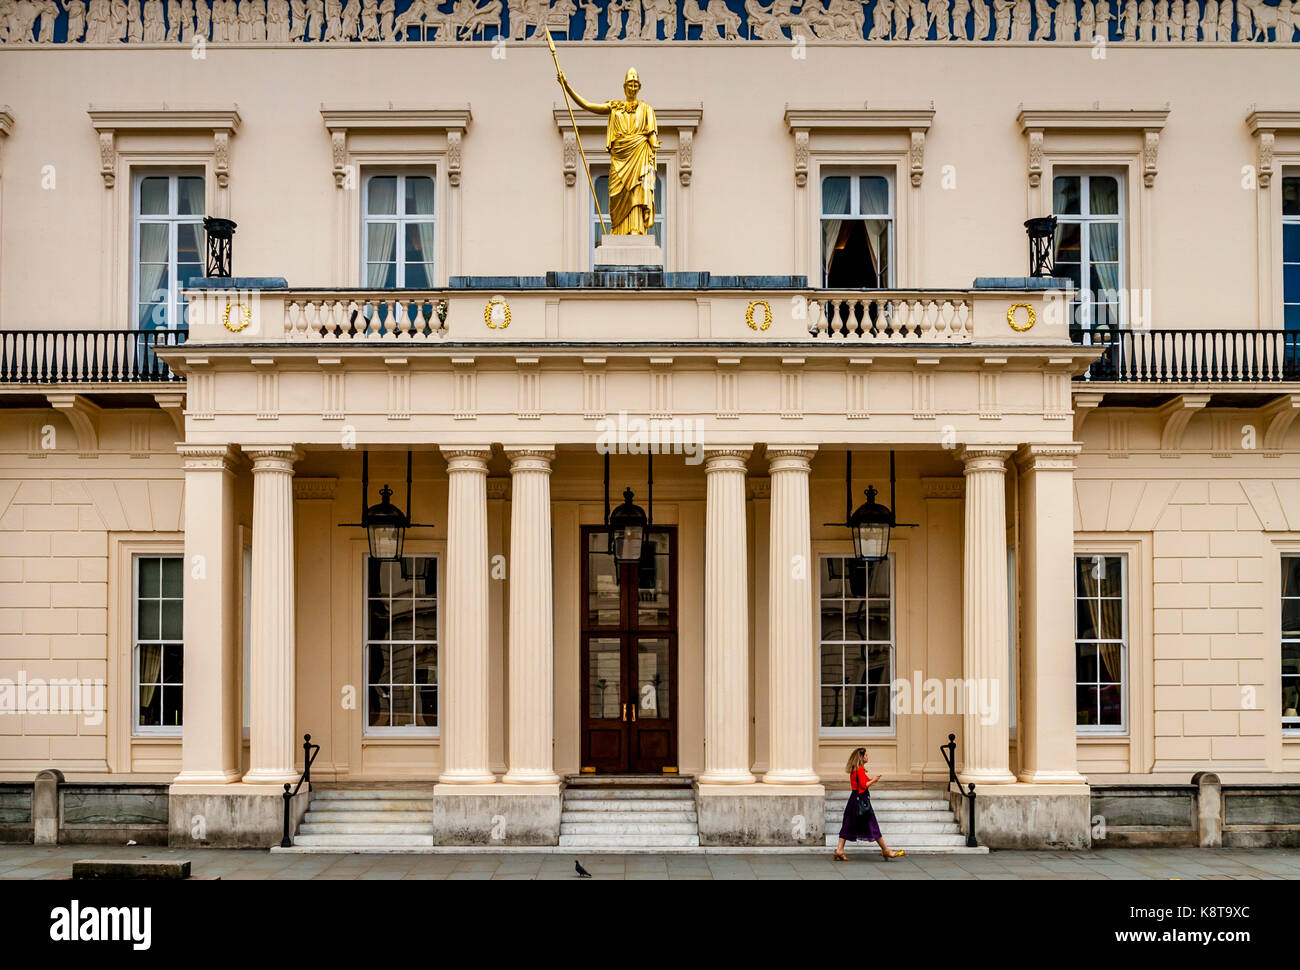 The Athenaeum Club, Pall Mall, London, UK - Stock Image